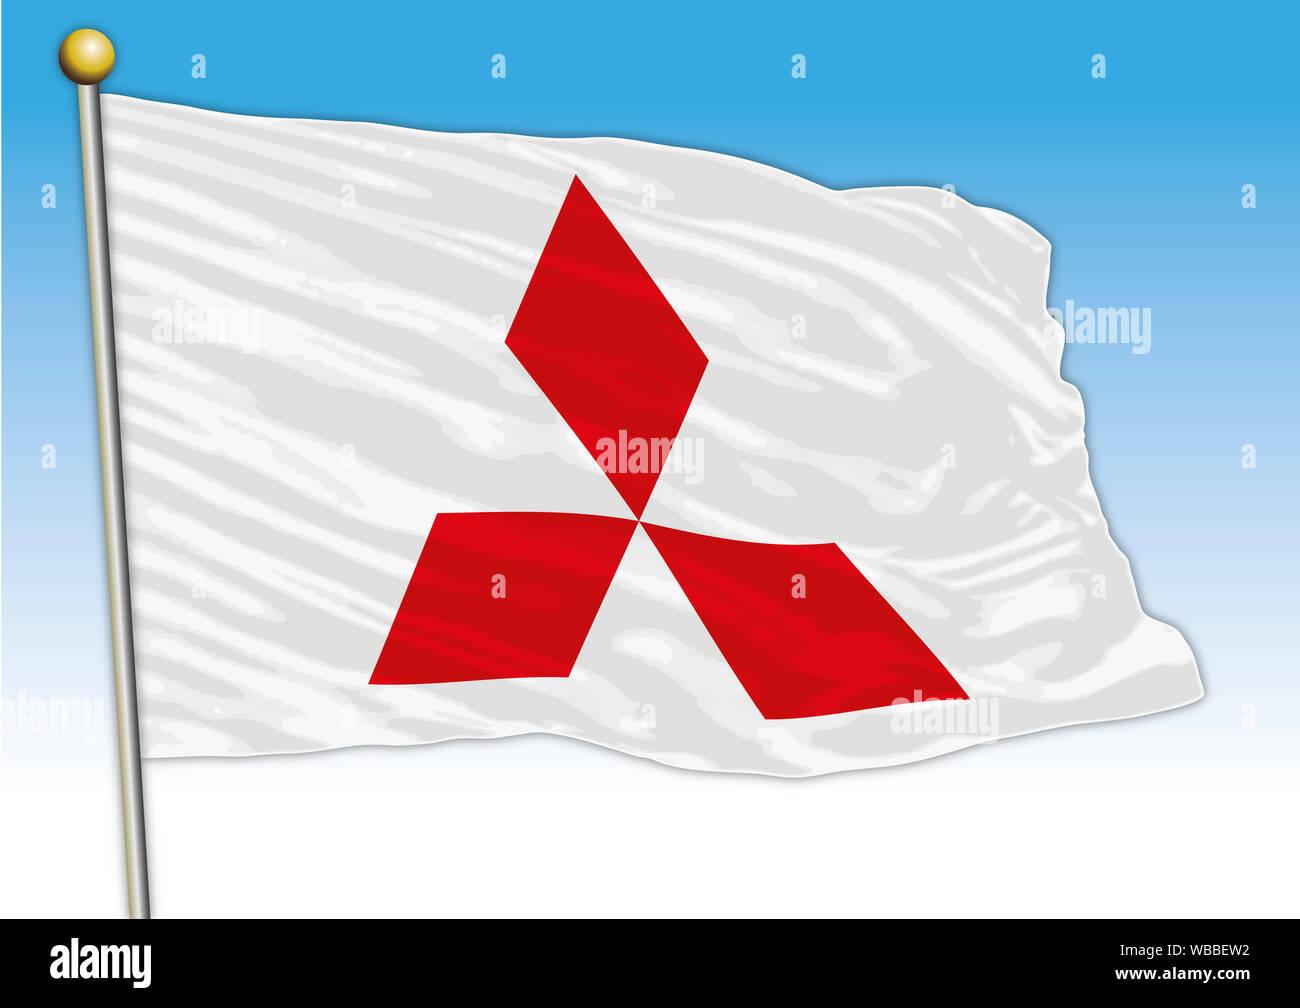 Mitsubishi car industrial group, flag with logo, illustration Stock Photo